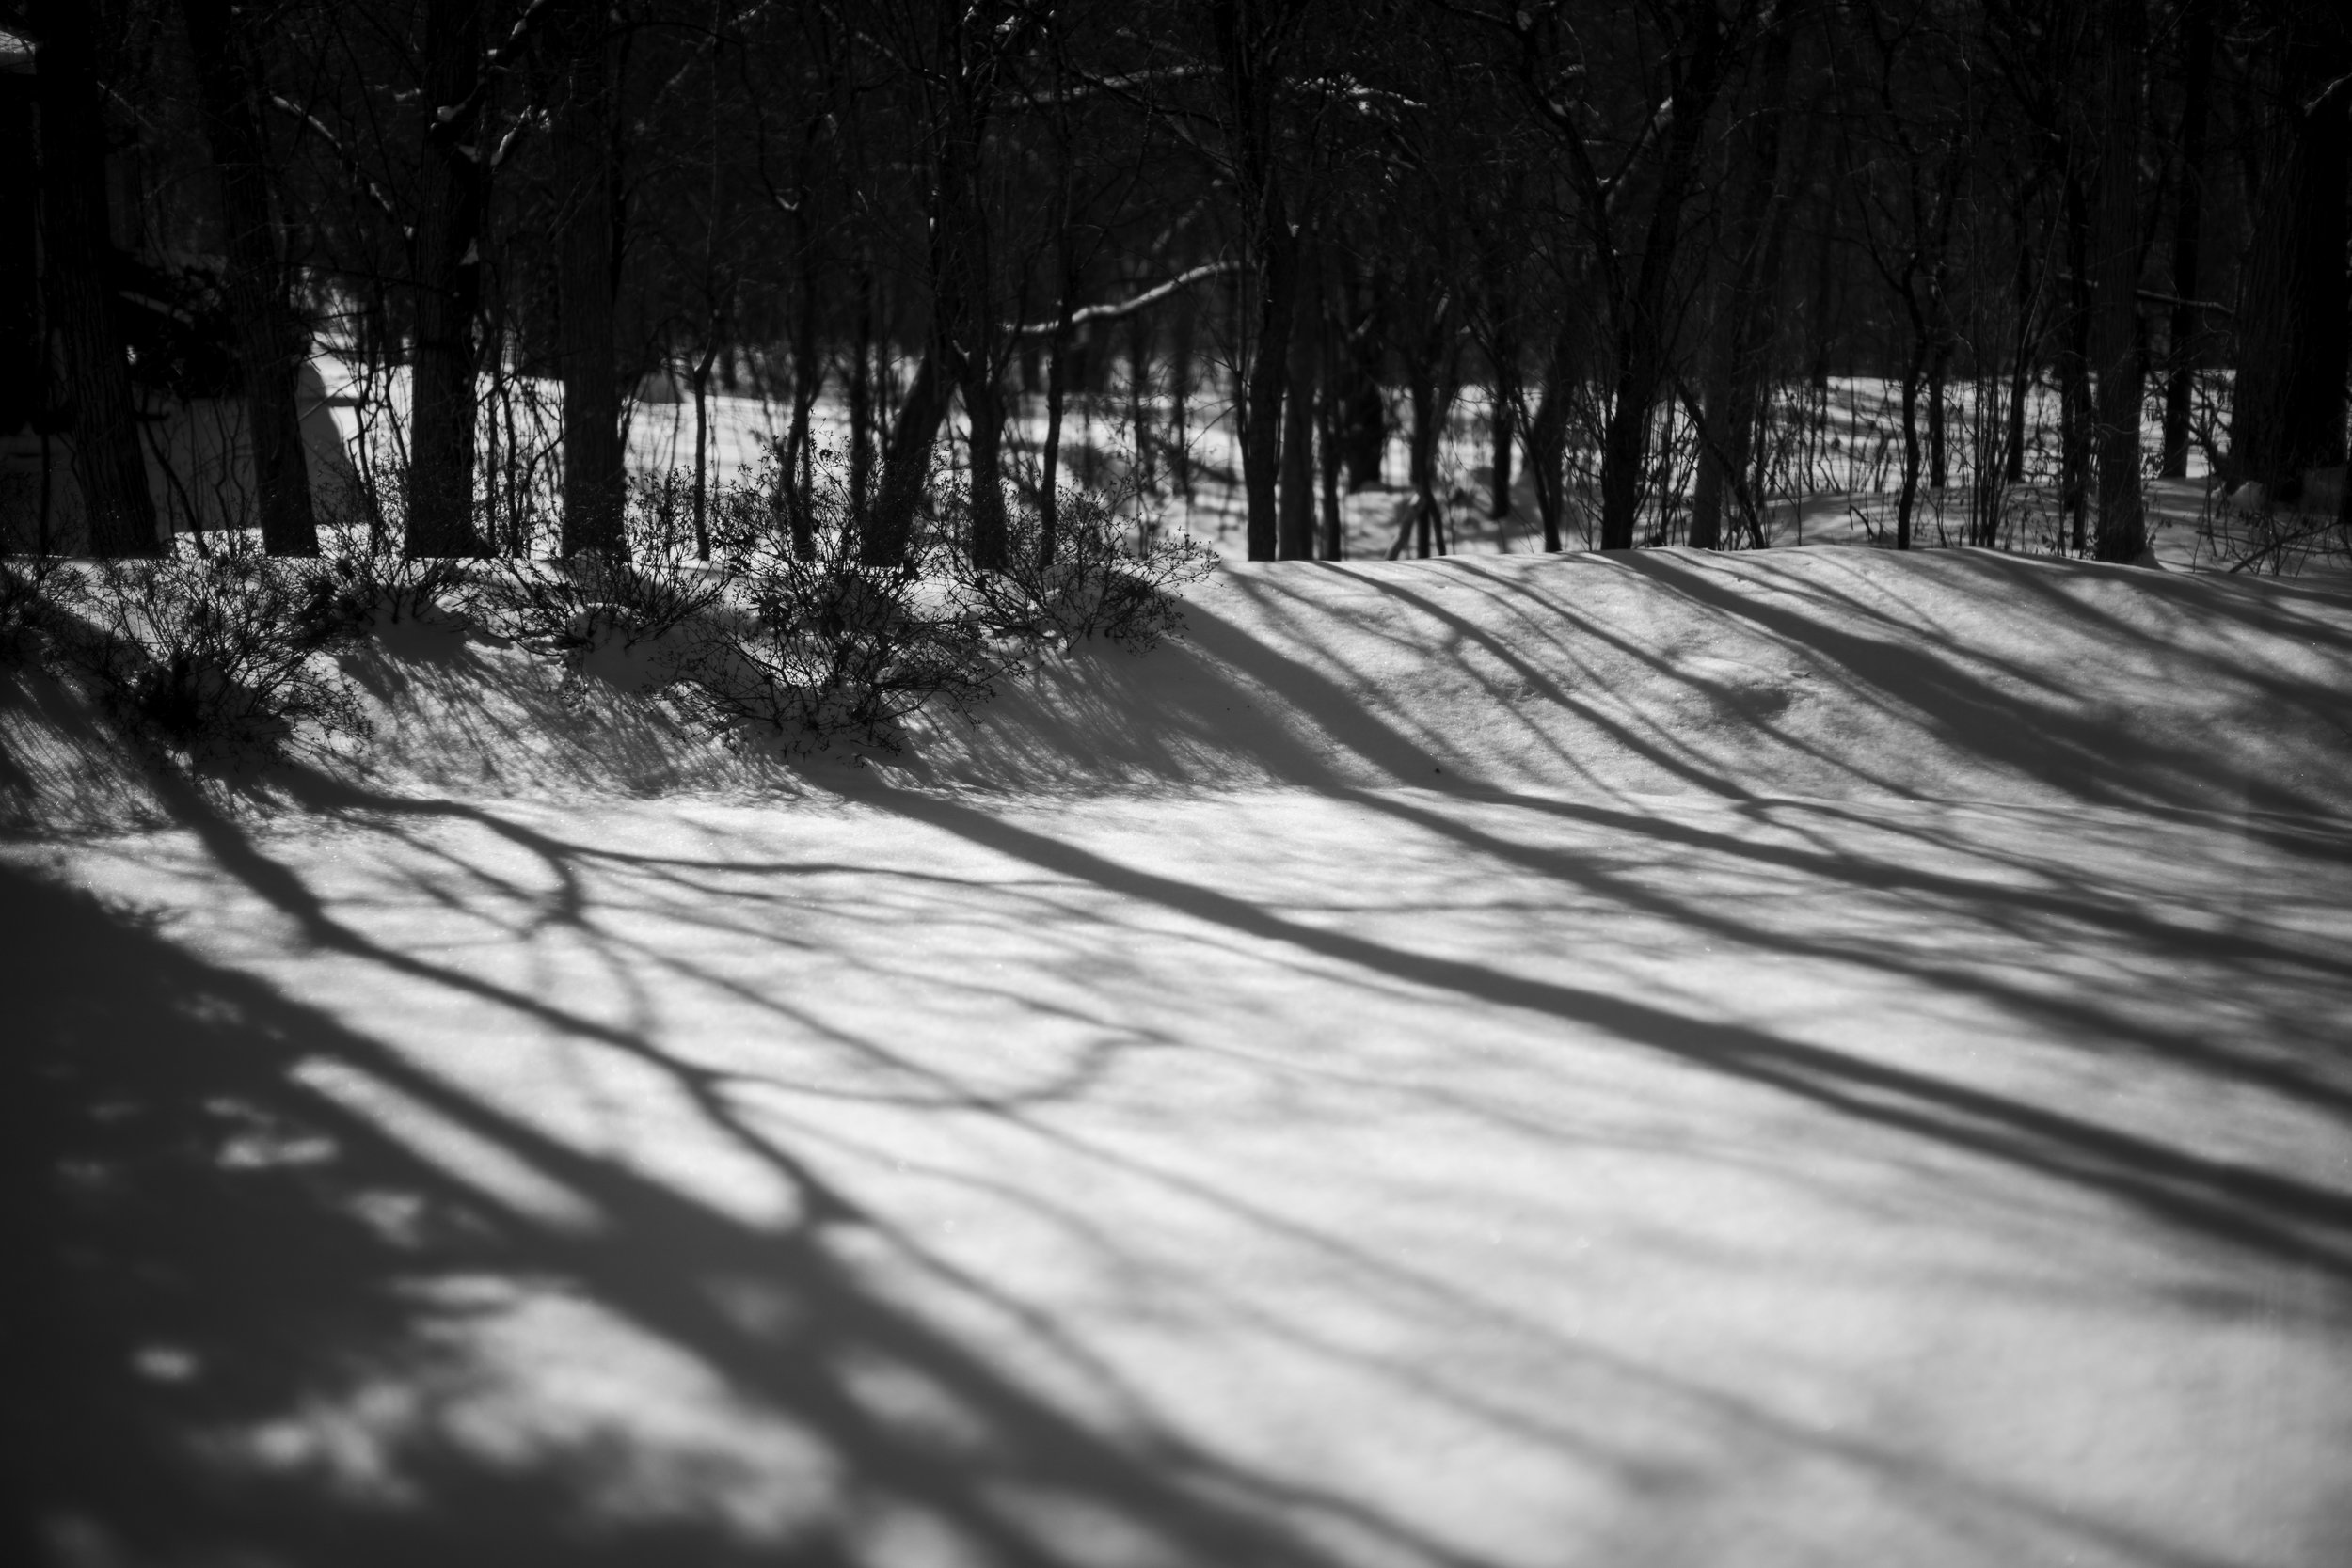 Tree Shadows on Snow.jpg